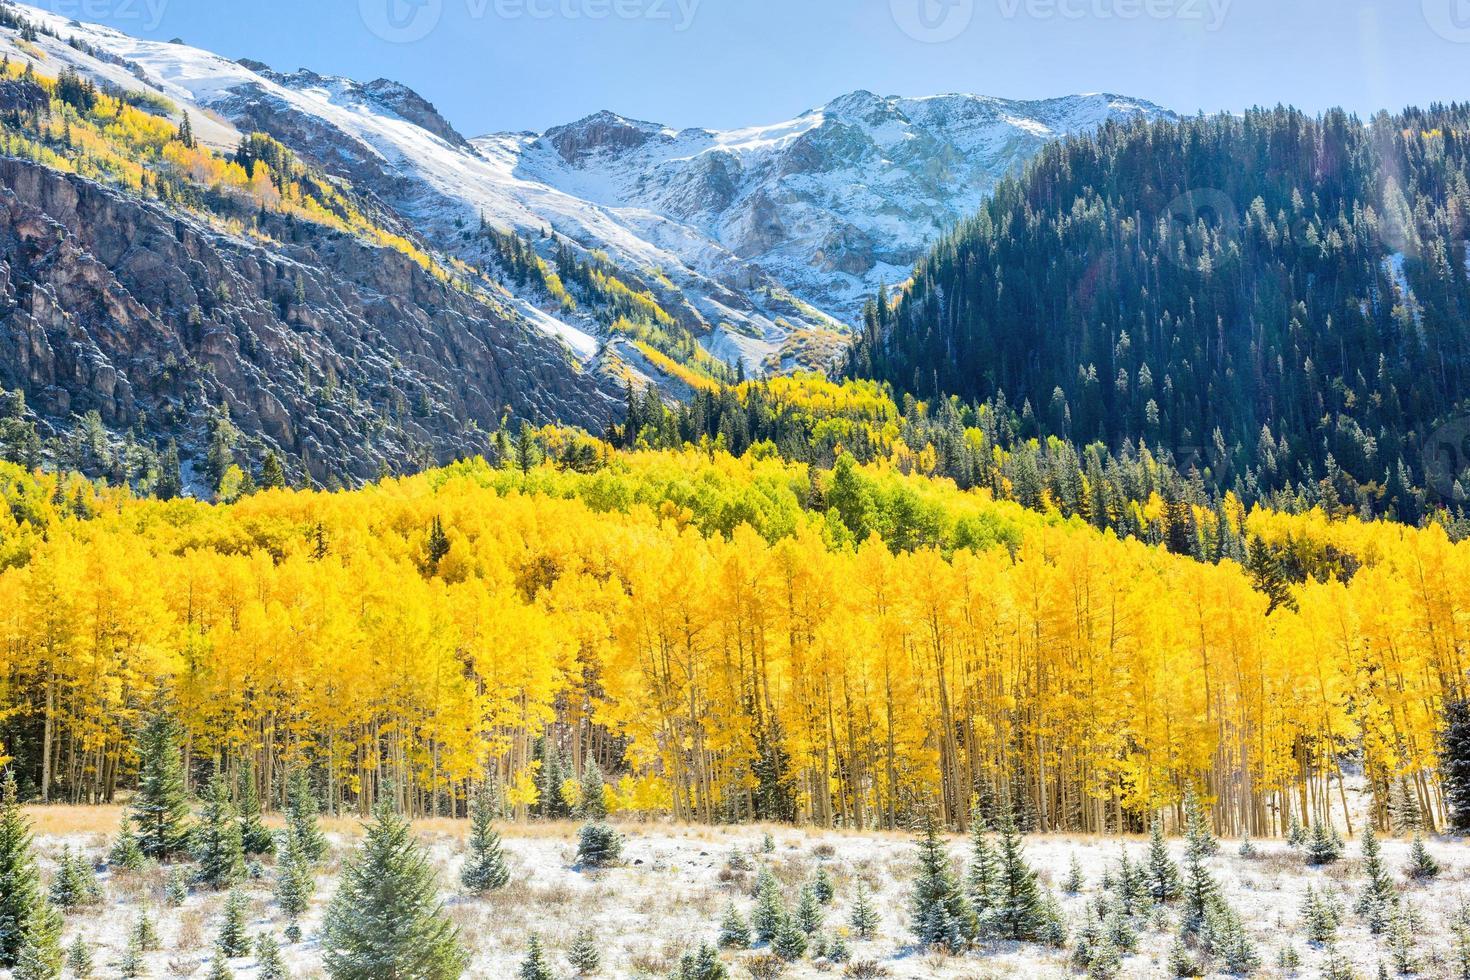 Autumn in Colorado photo